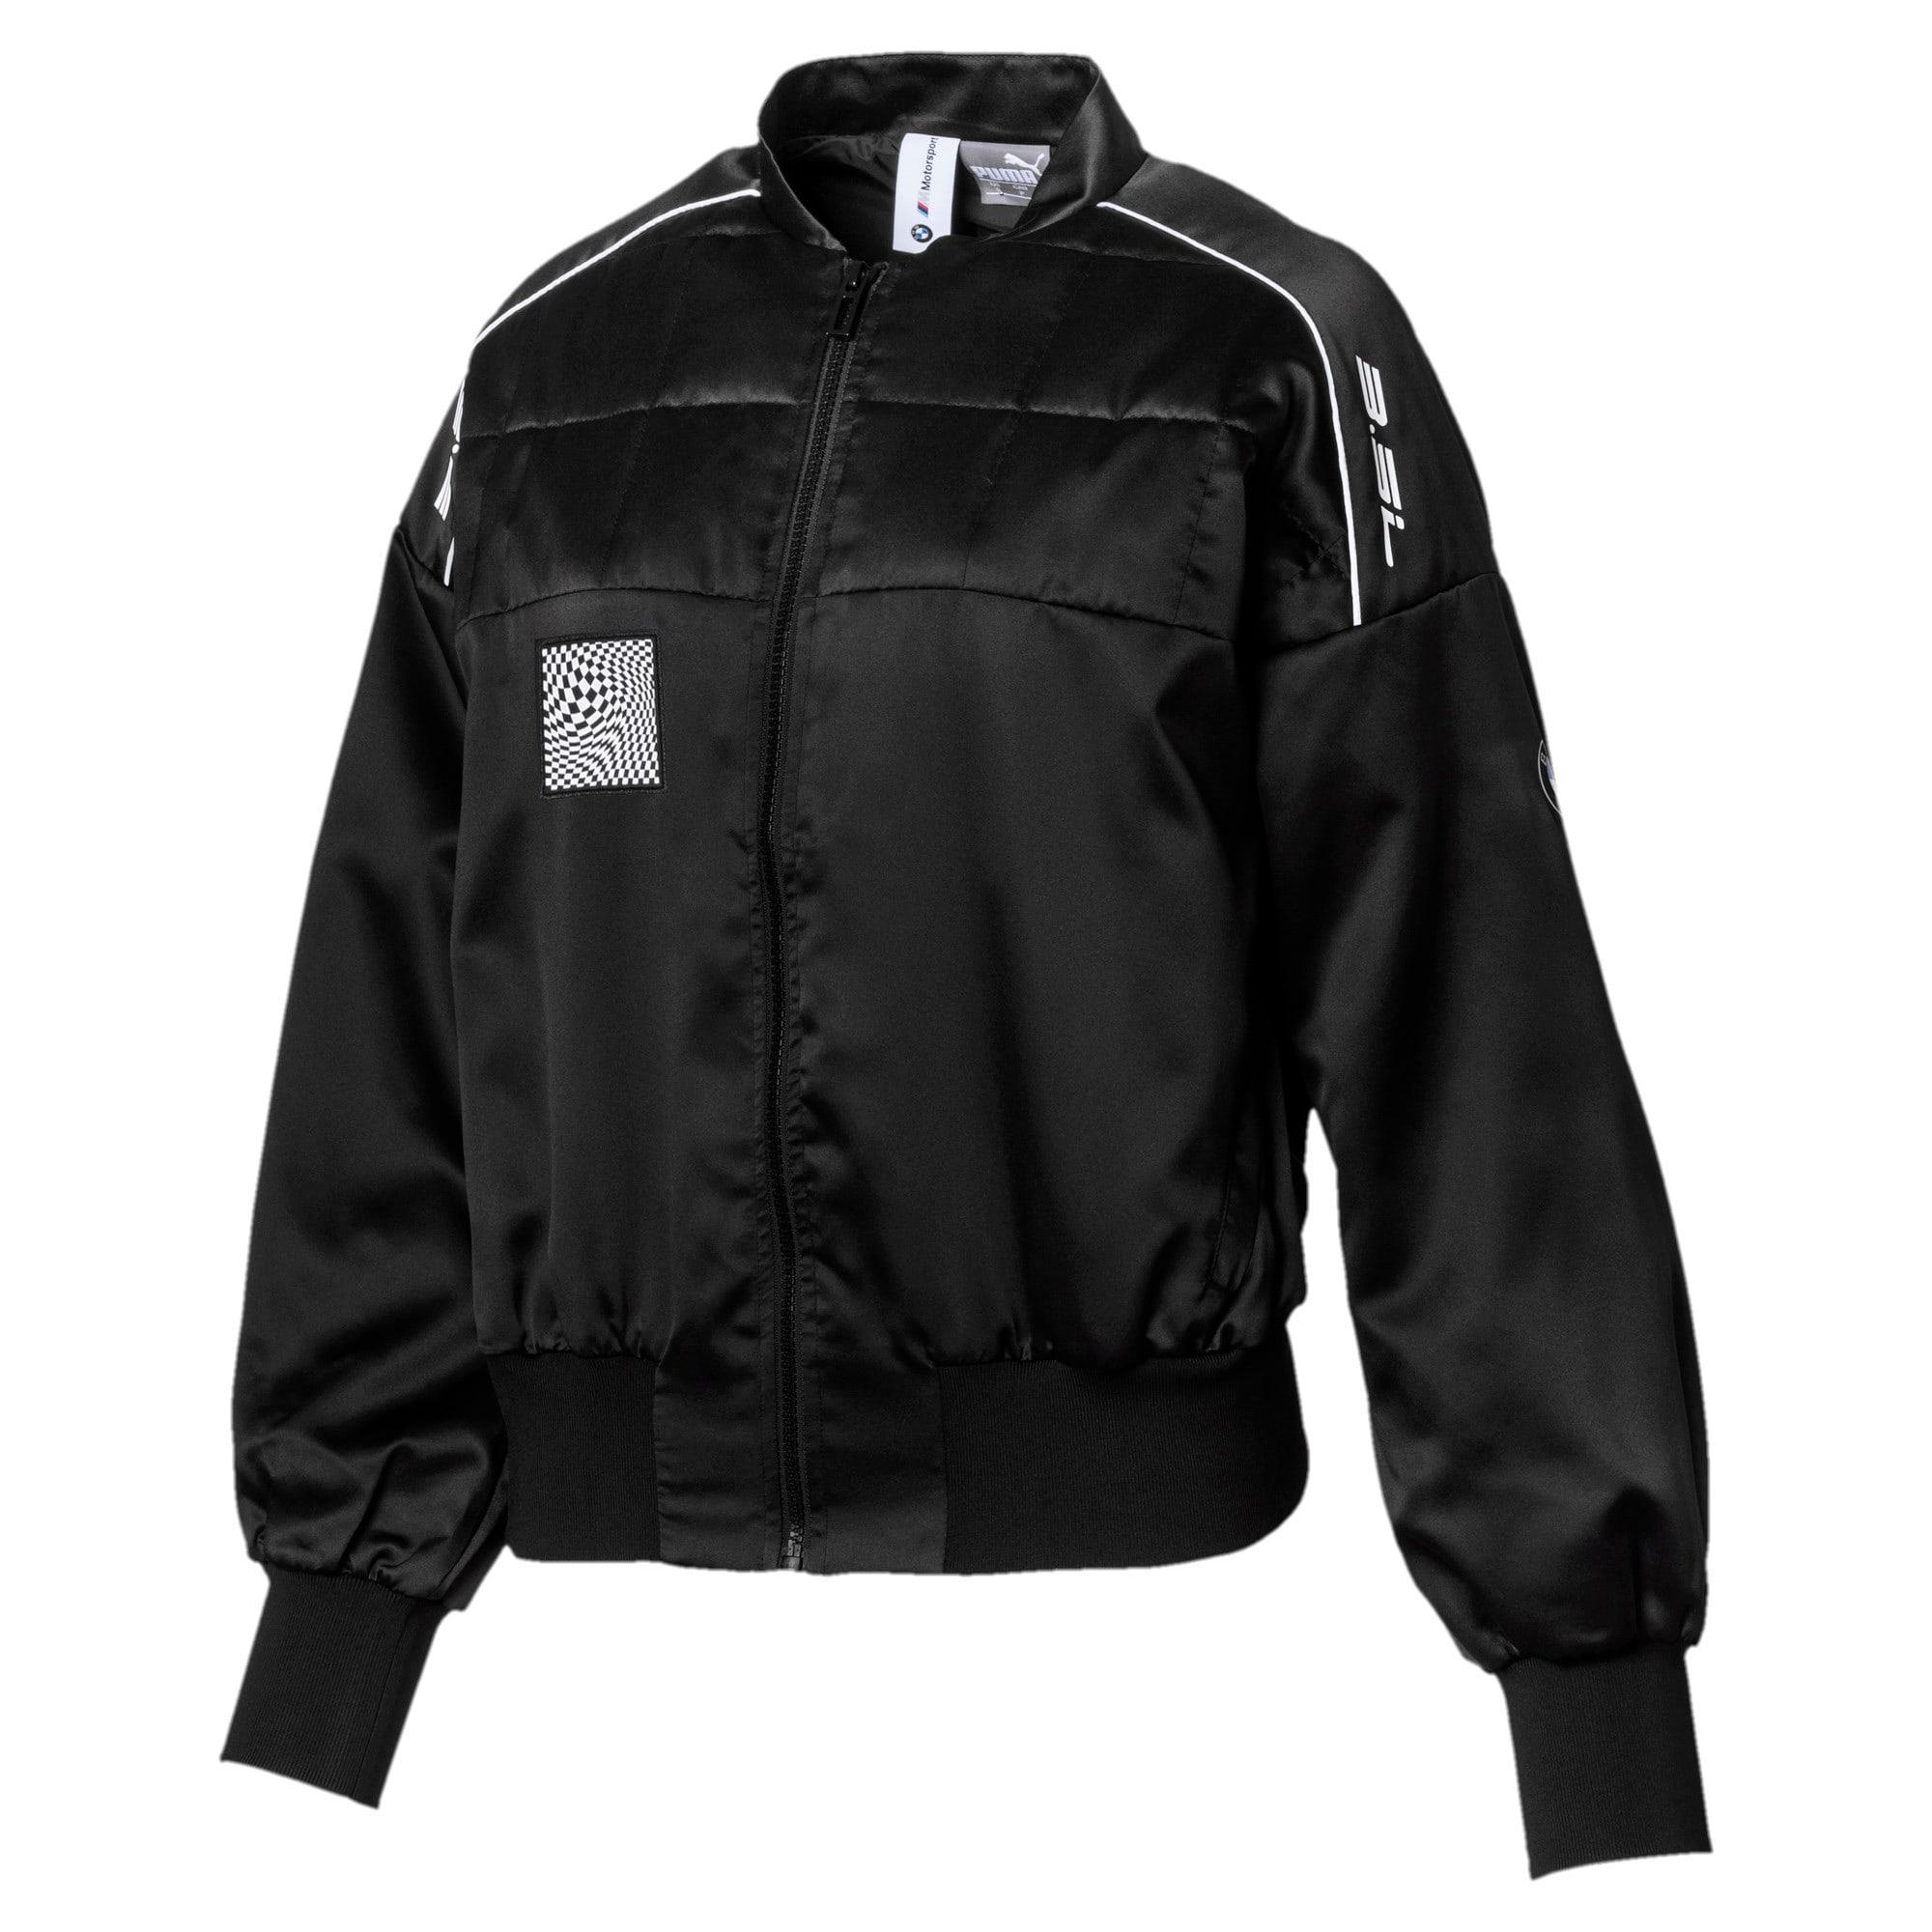 Thumbnail 1 of BMW M Motorsport Street Women's Jacket, Puma Black, medium